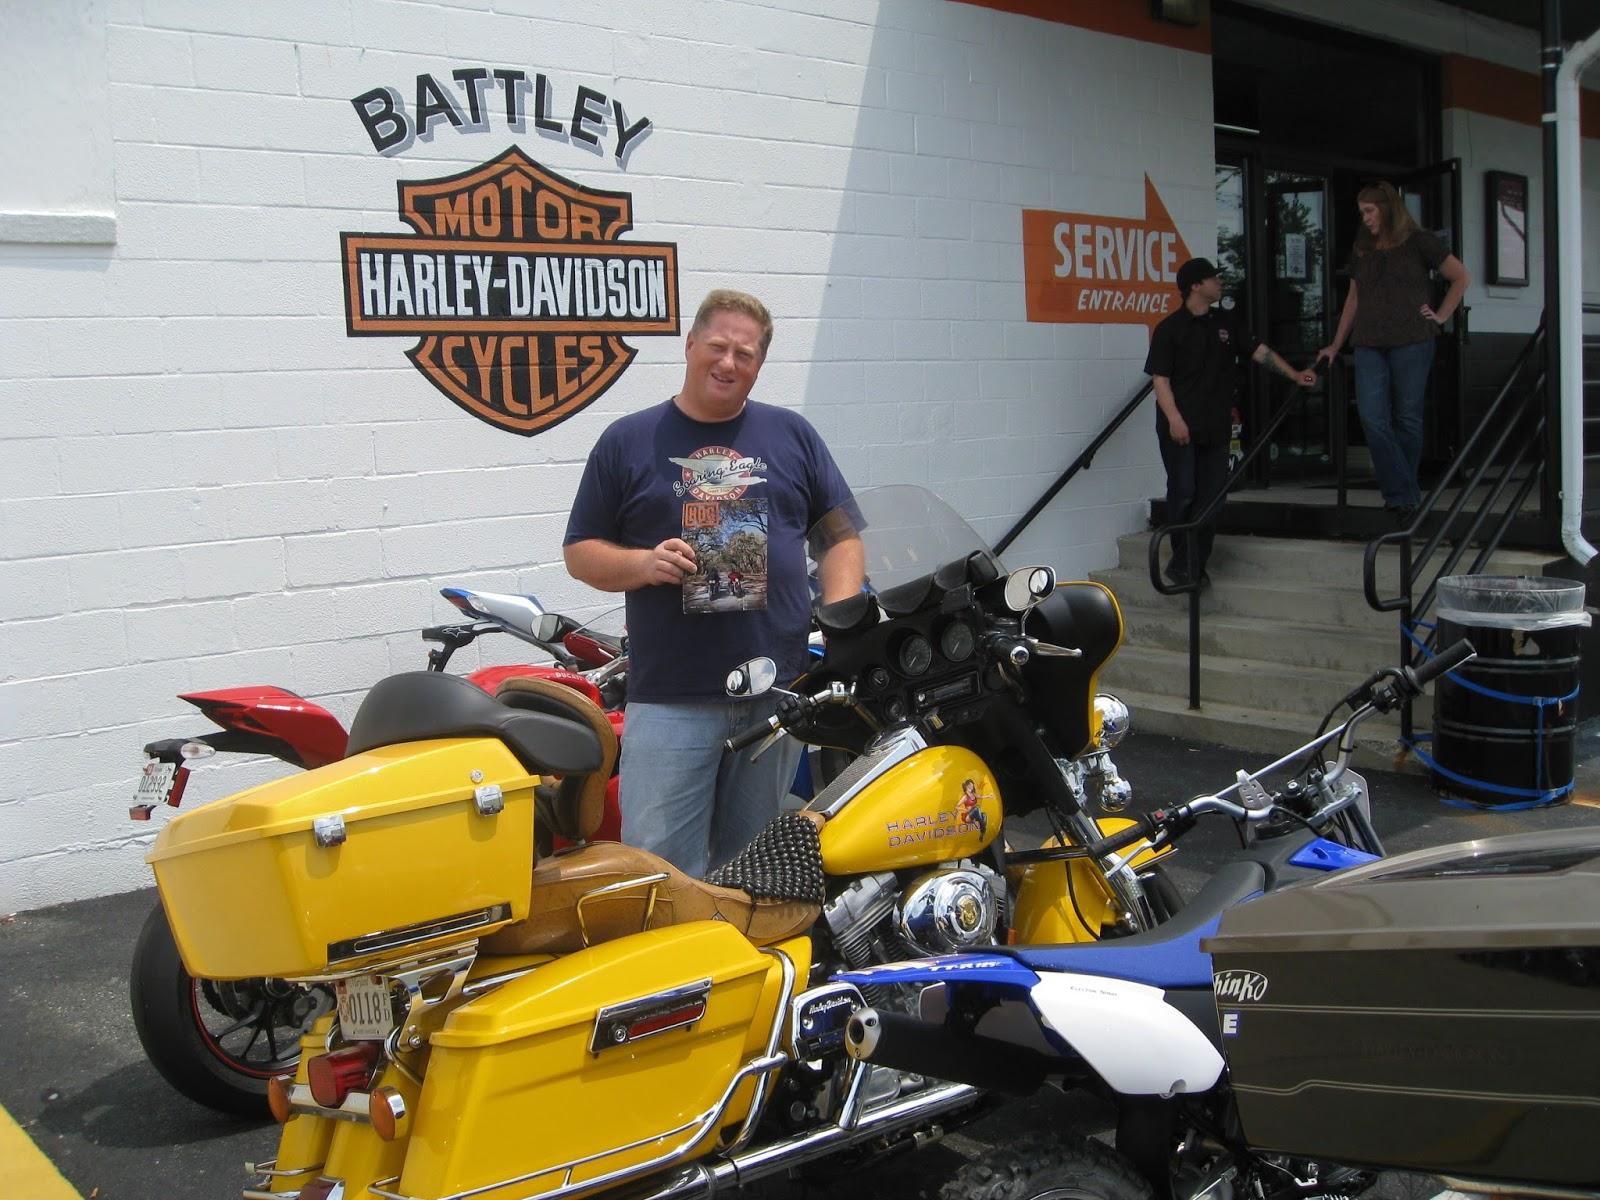 The Battley Blog: Motorcycle battery maintenance